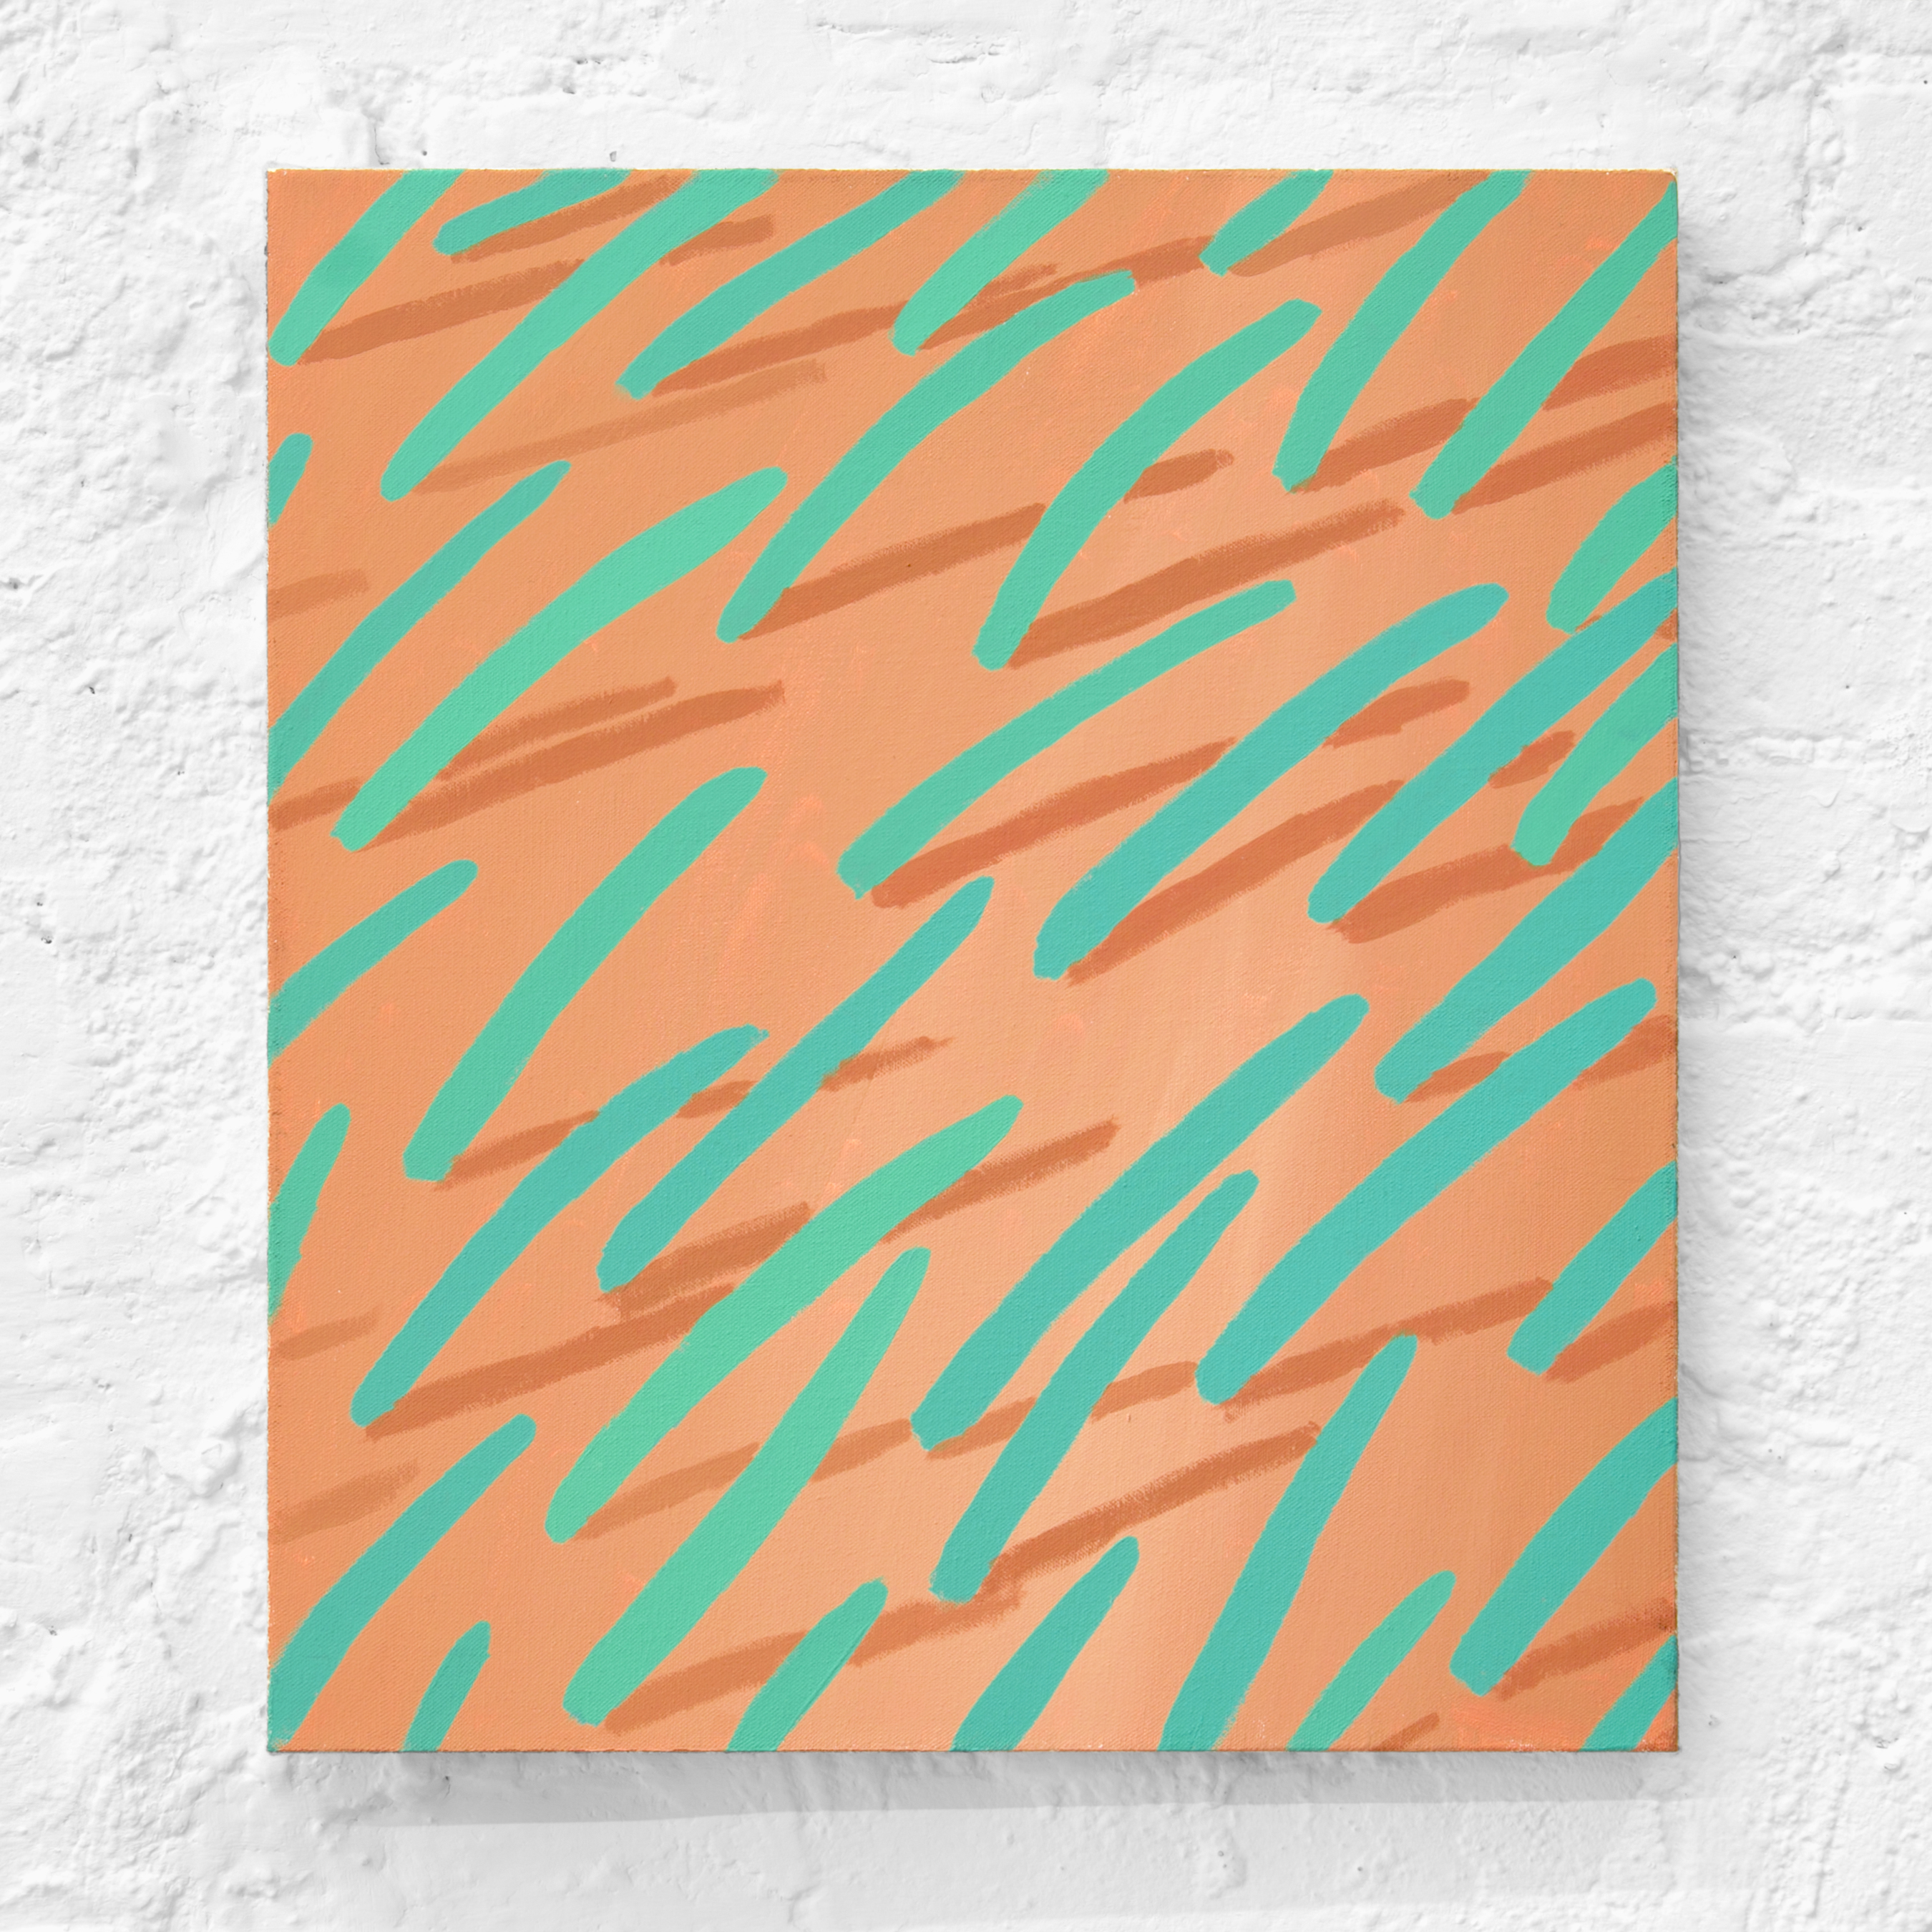 Corydon Cowansage, Grass 59, 2016, acrylic on canvas, 18 x 16 inches. Photo credit: Kirsten Kilponen. Courtesy 17 Essex, New York